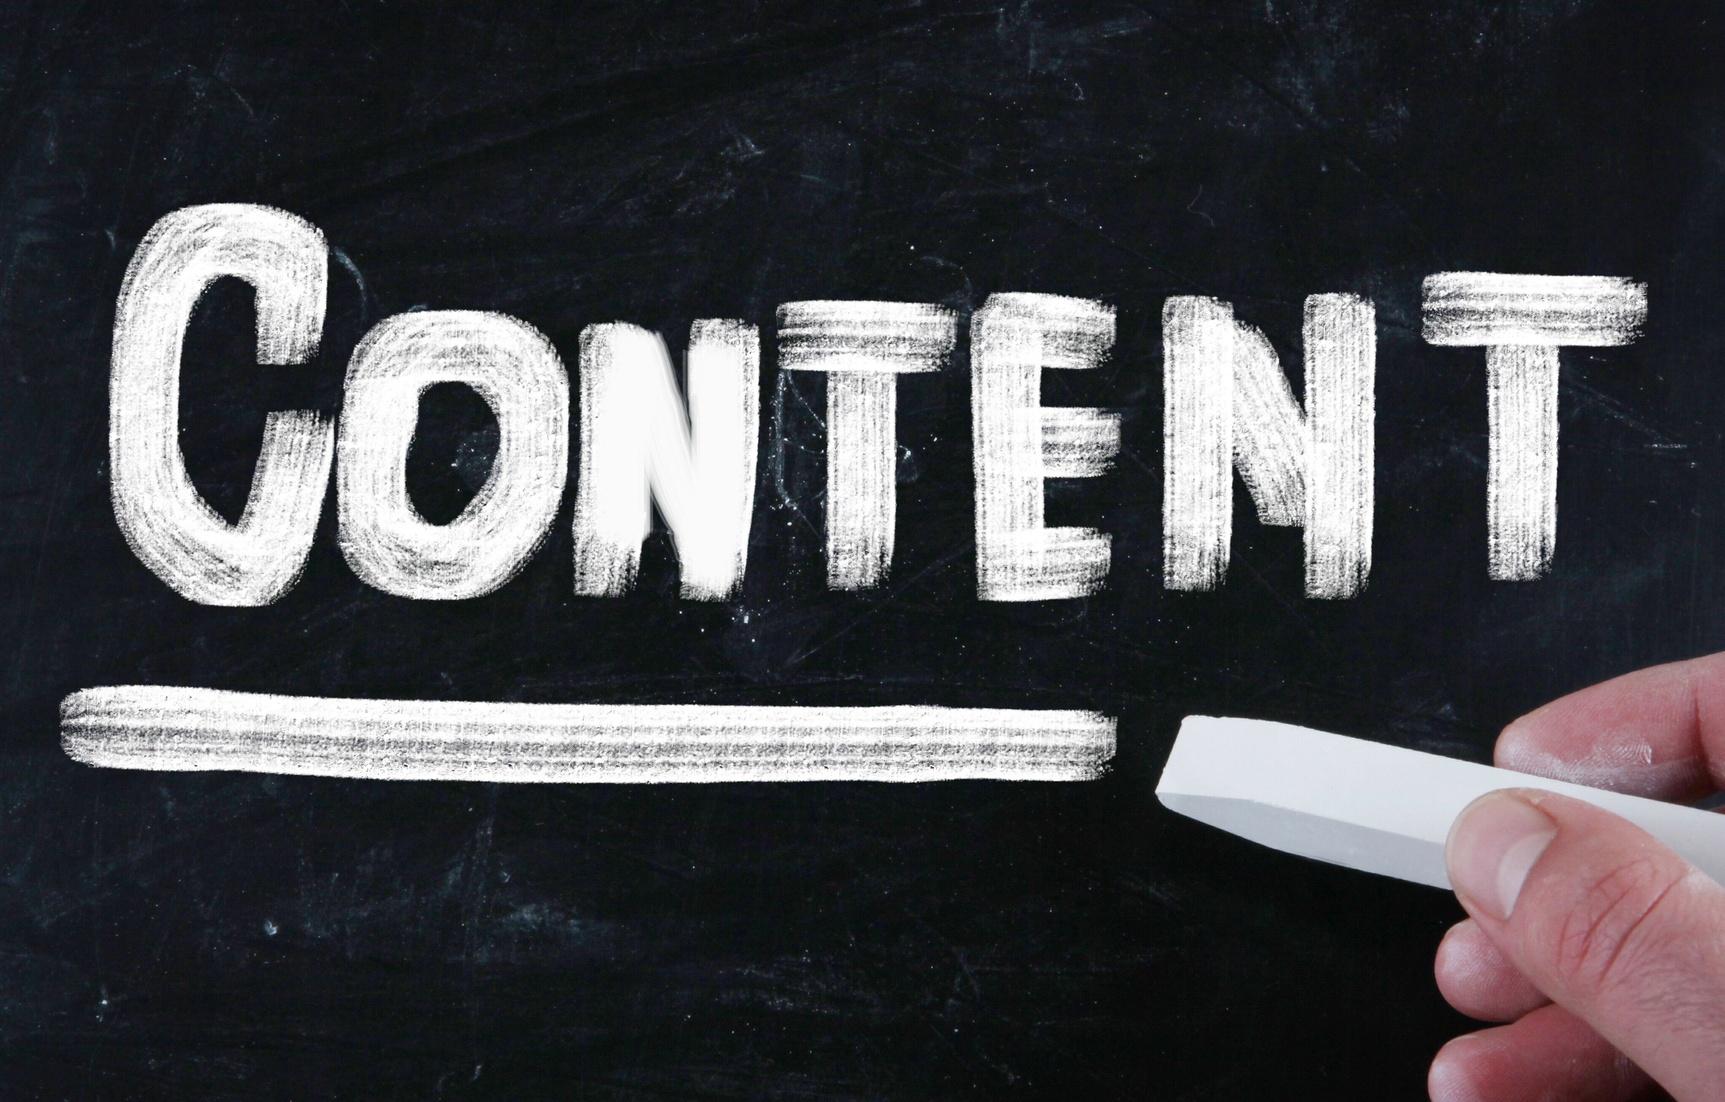 10 Secrets to Blockbuster Blog Content (8 words - actionable, keywords, clear, definitive)